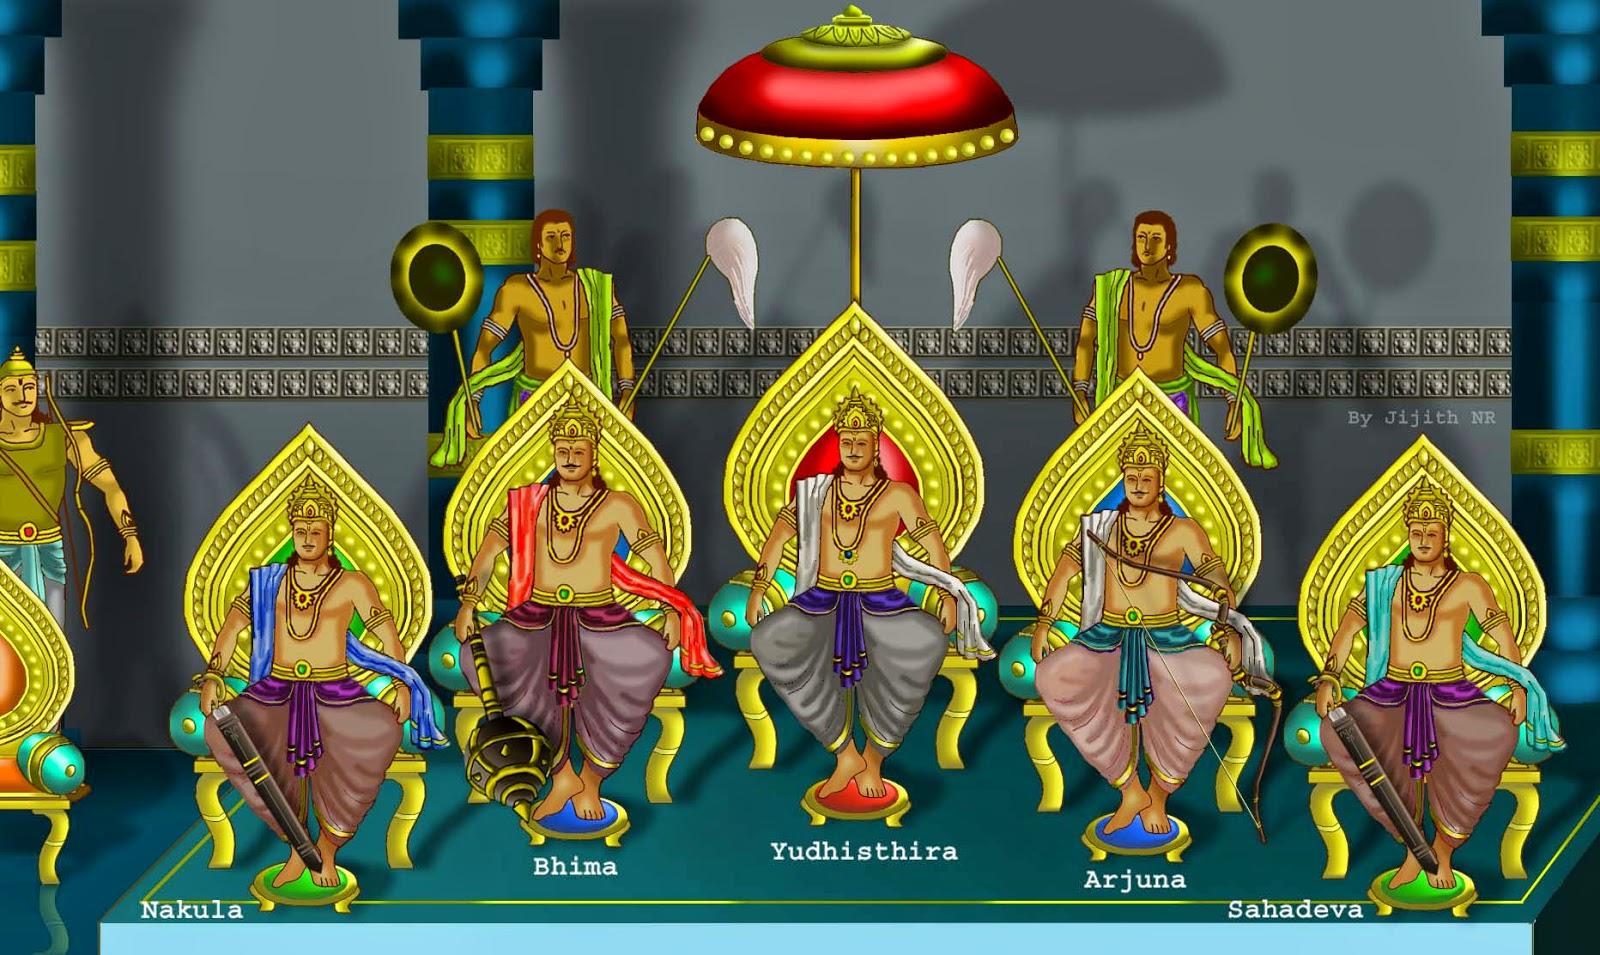 Five Pandavas